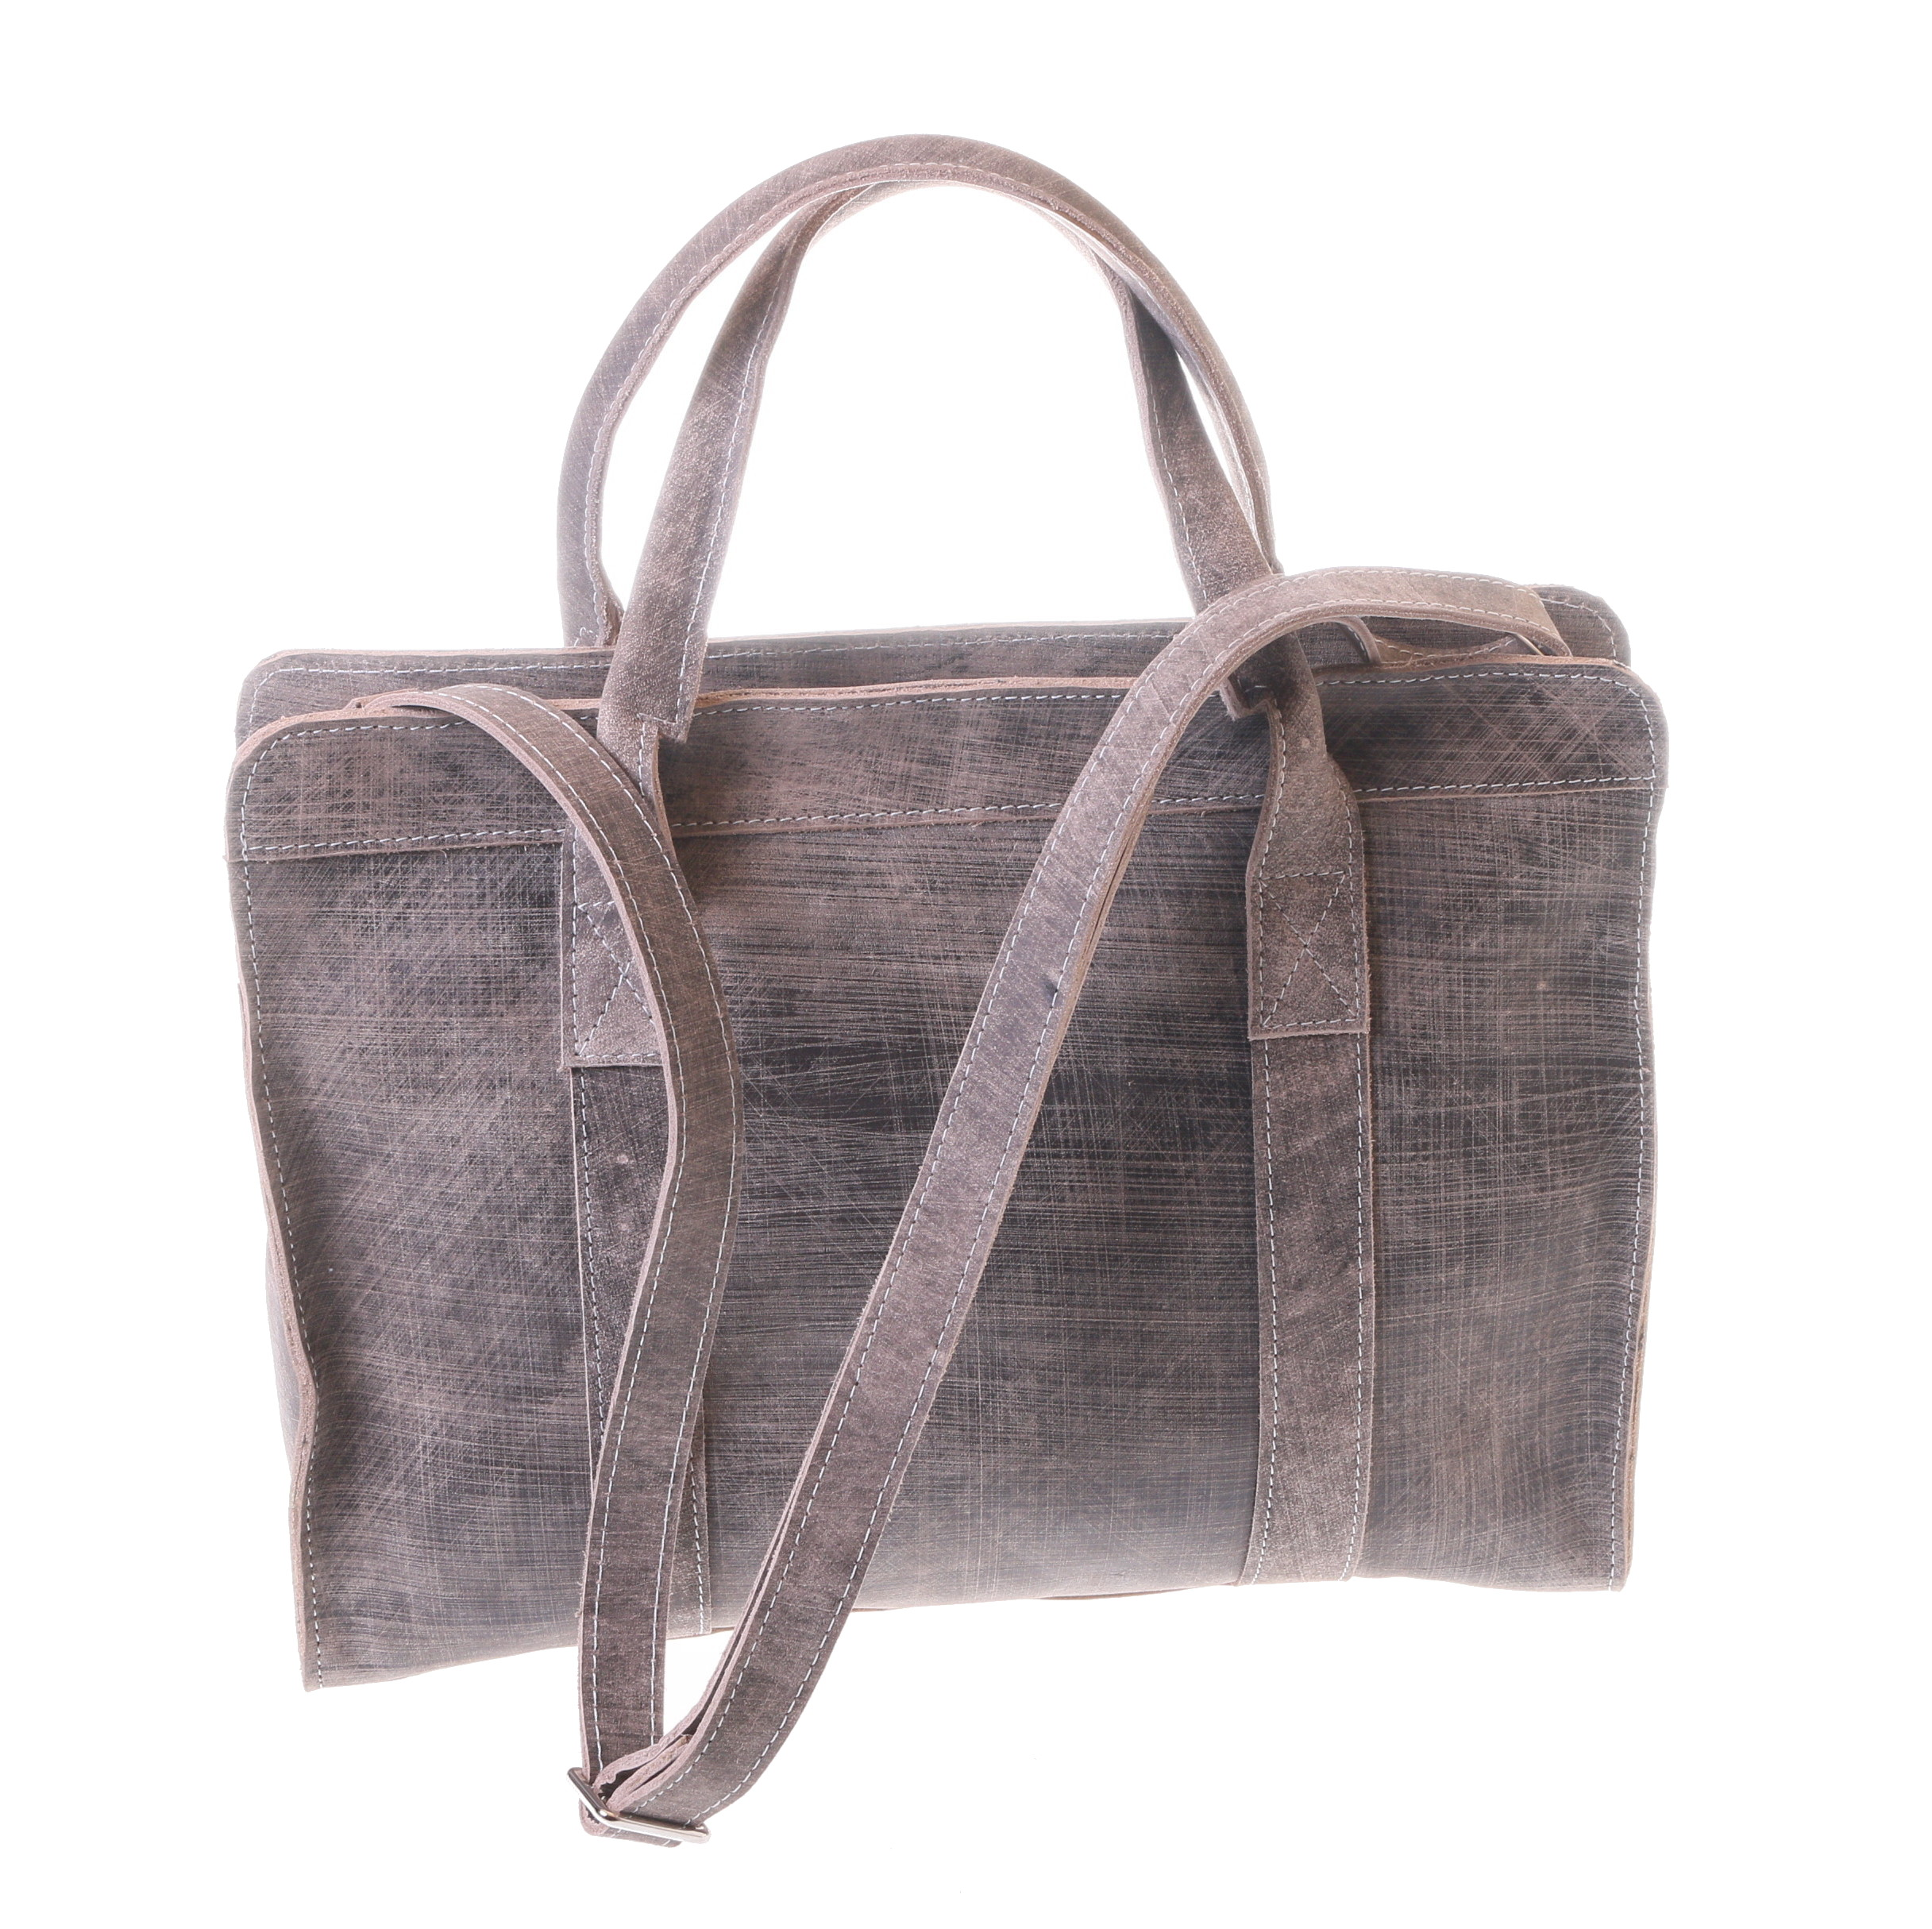 Gundara - cool grey-scratch handbag - fair & elegant - handmade in Ethiopia